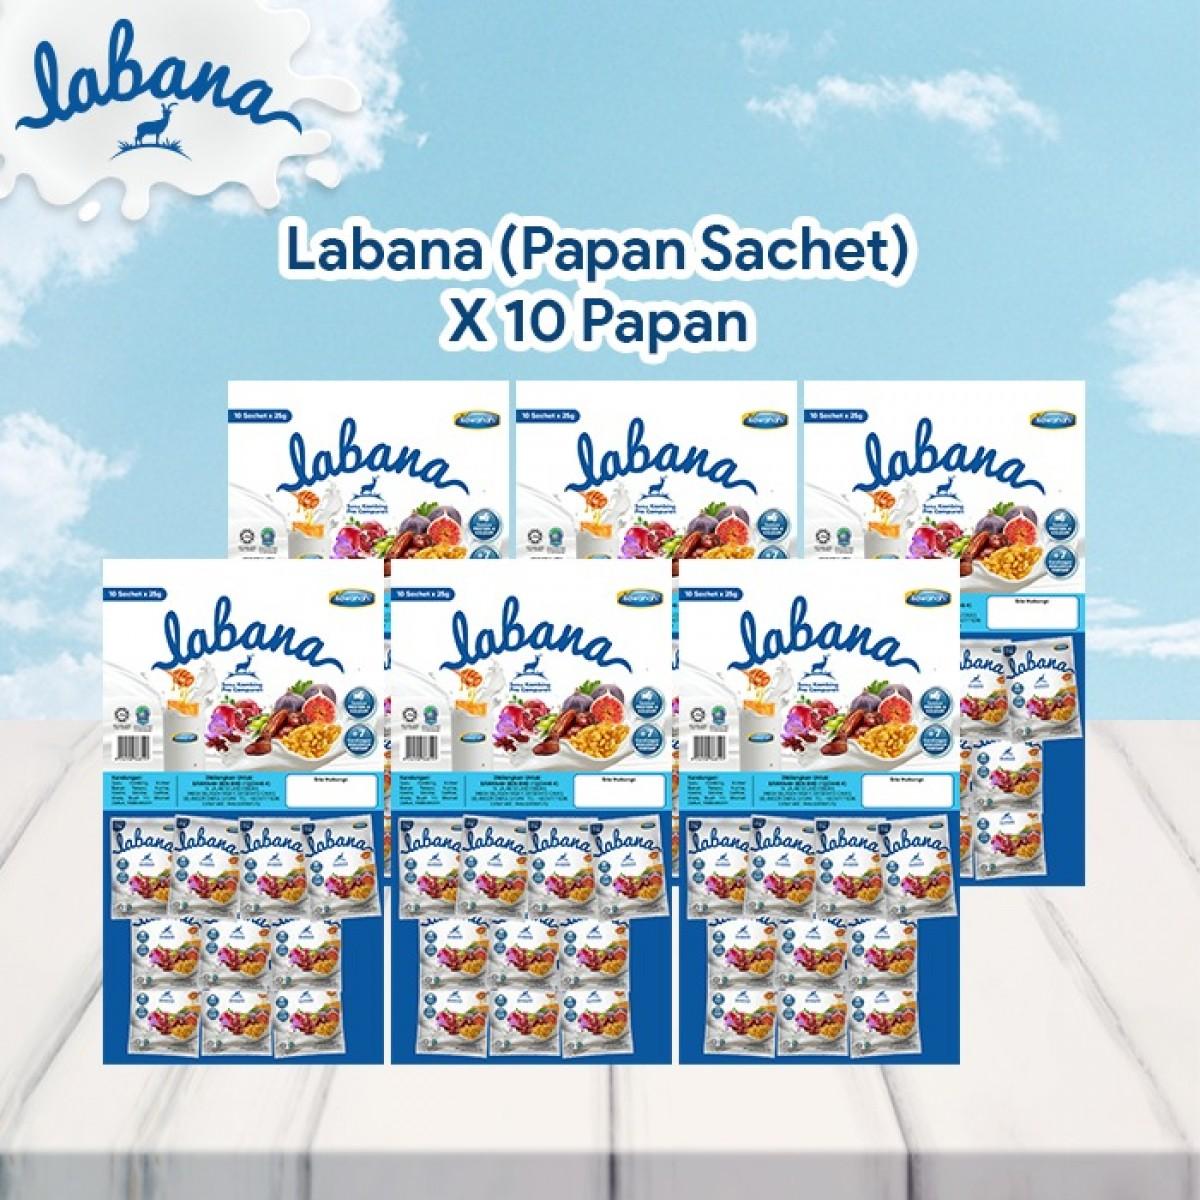 AGEN Labana Susu Kambing - Papan Sachet (10 Pek) - Sawanah HQ